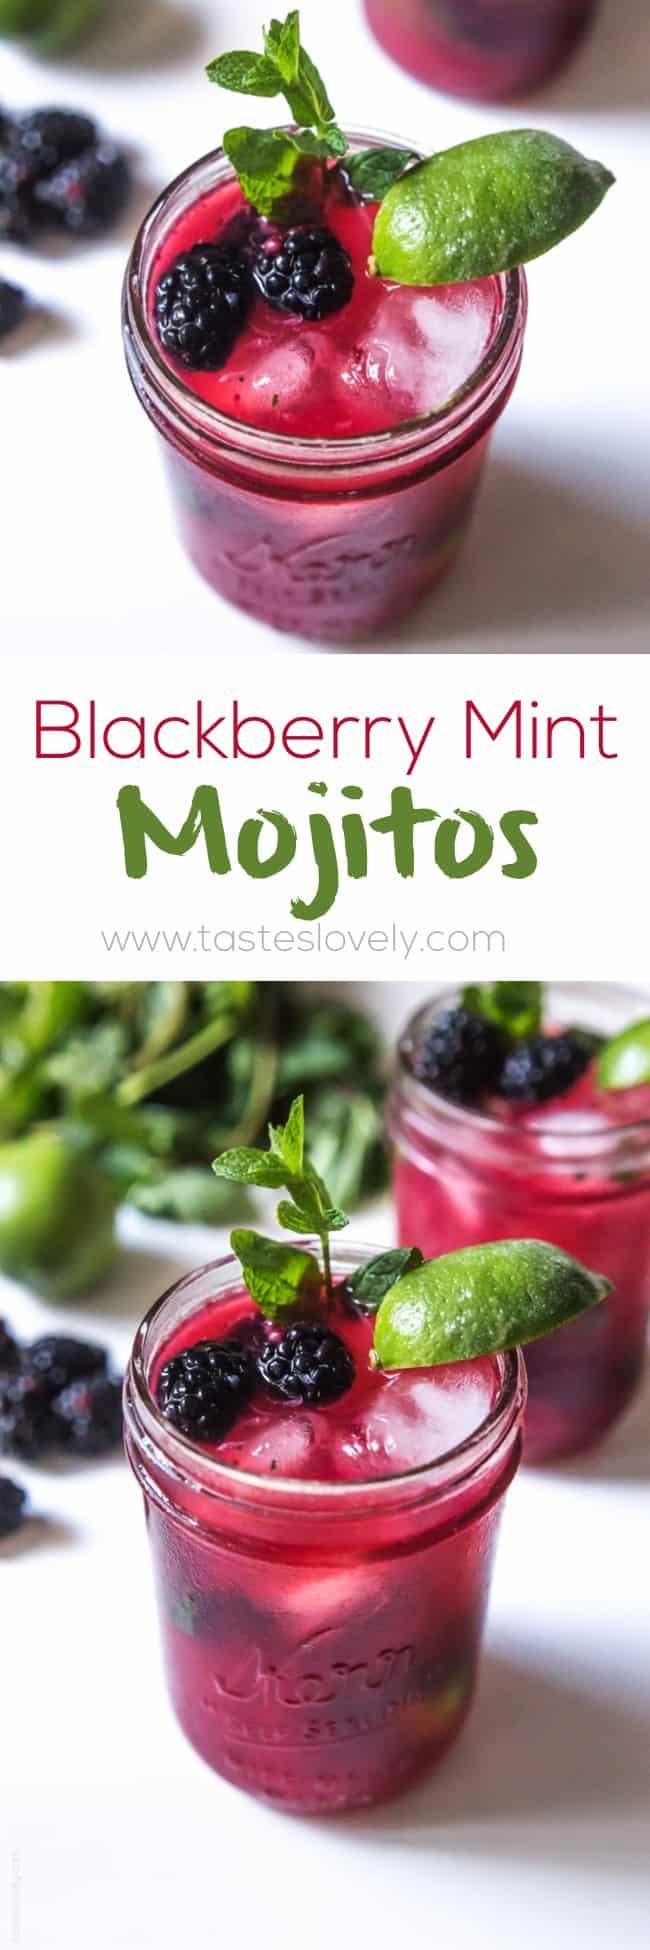 Blackberry Mint Mojitos - Tastes Lovely